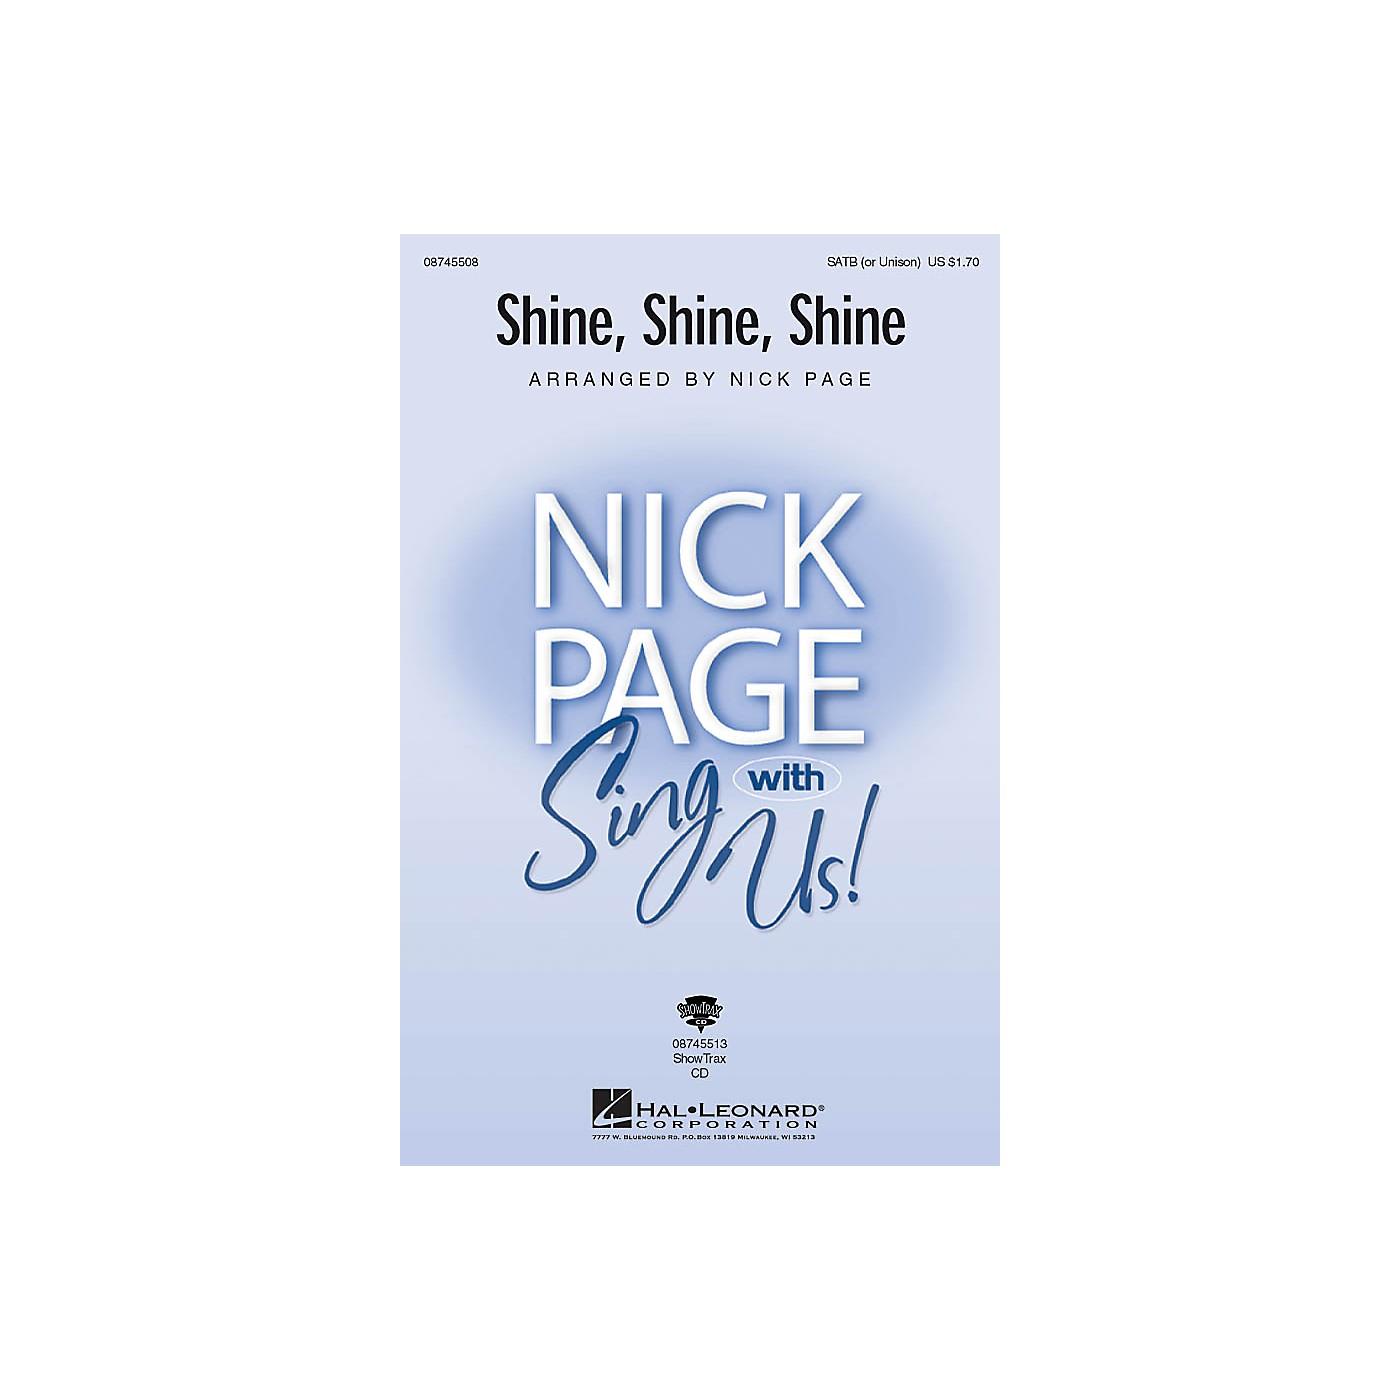 Hal Leonard Shine, Shine, Shine SATB (OPT UNISON) arranged by Nick Page thumbnail